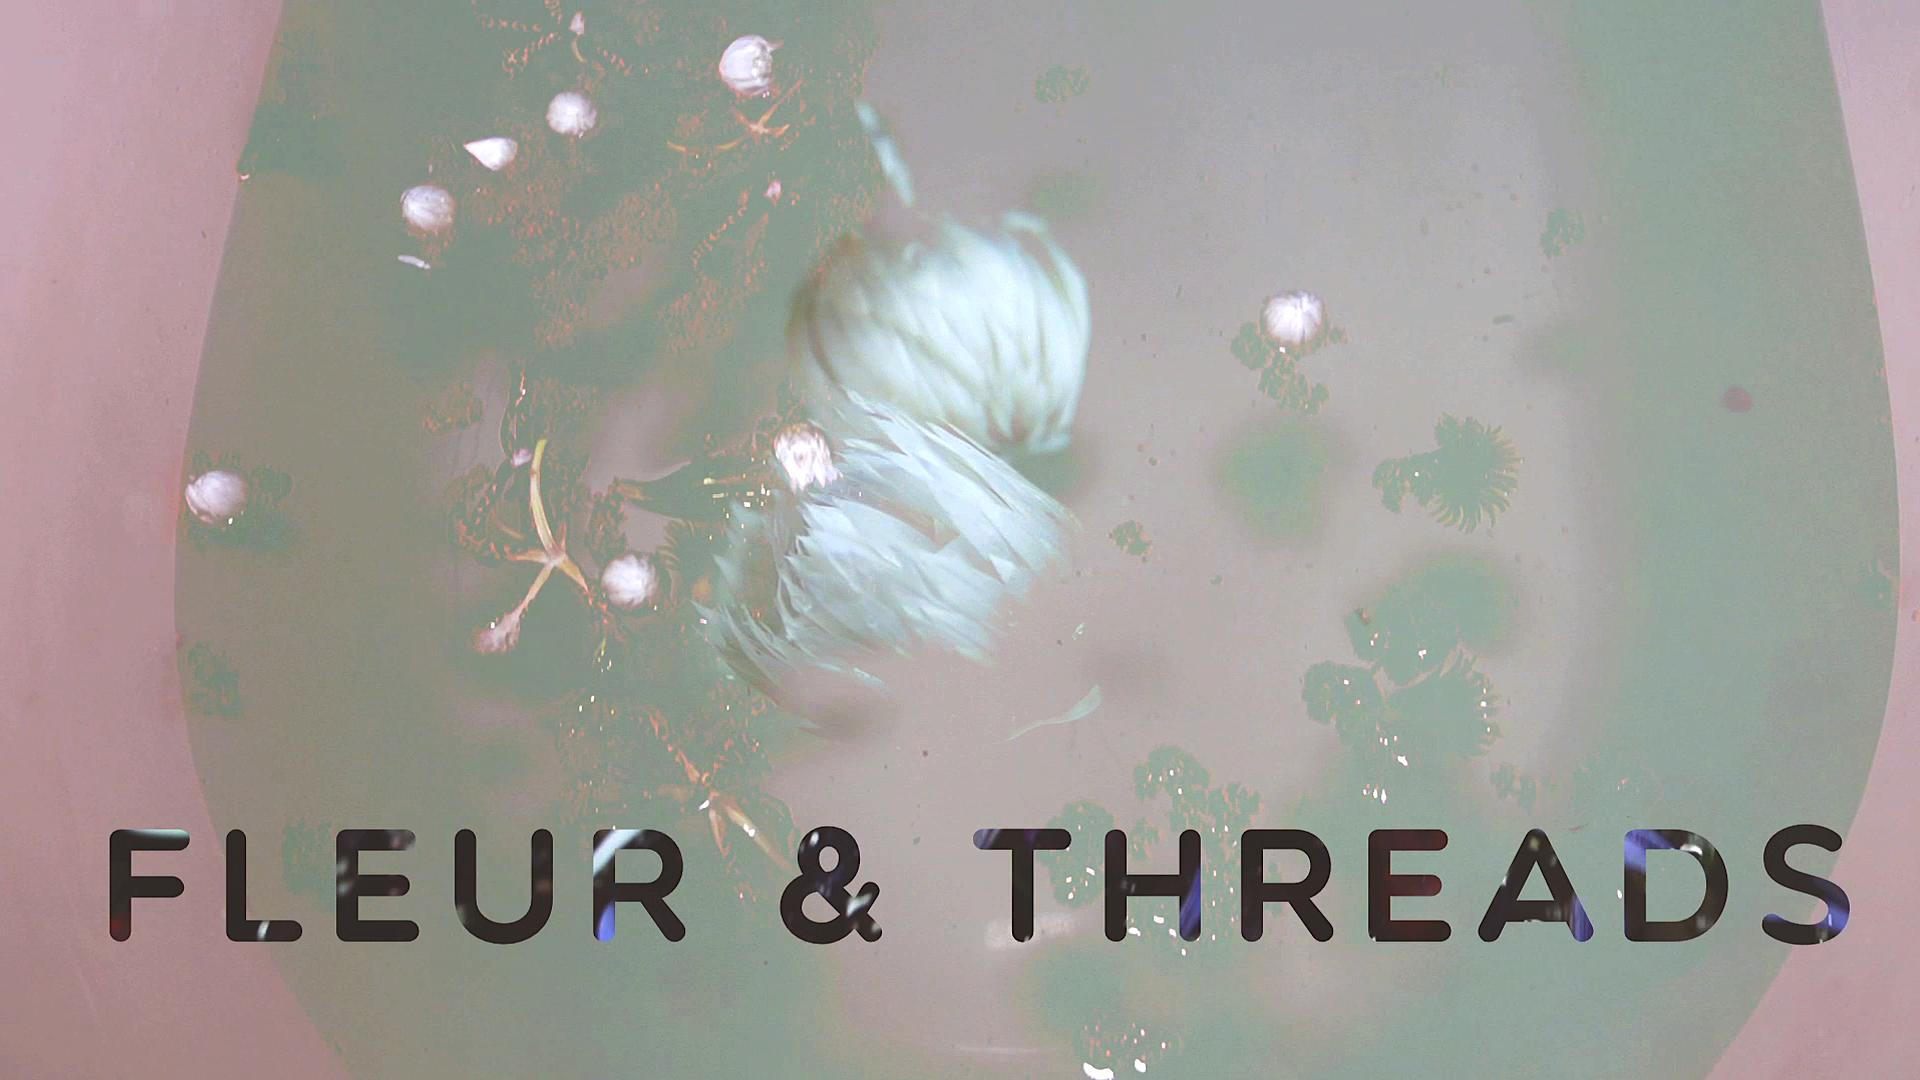 Fleur + Threads x Fling Fling